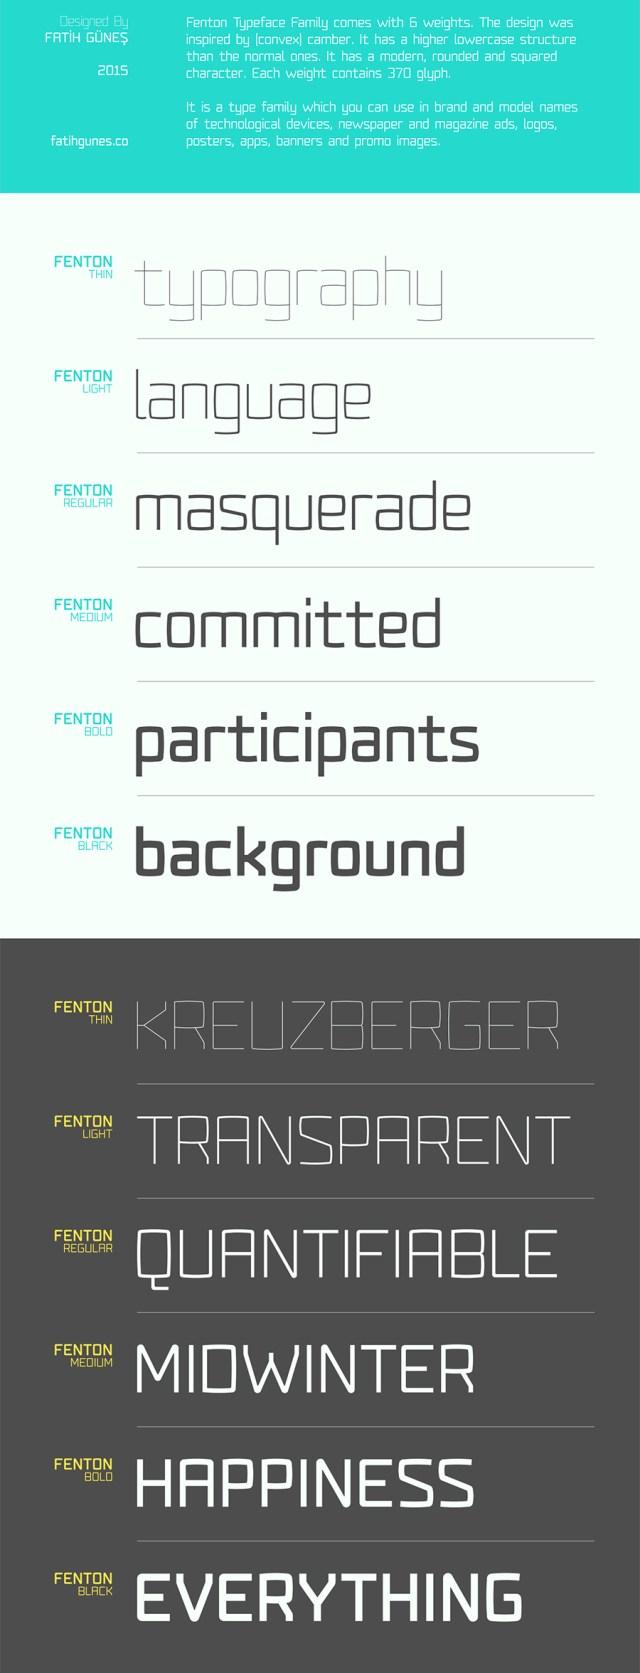 Fenton Typeface Family - Freebie